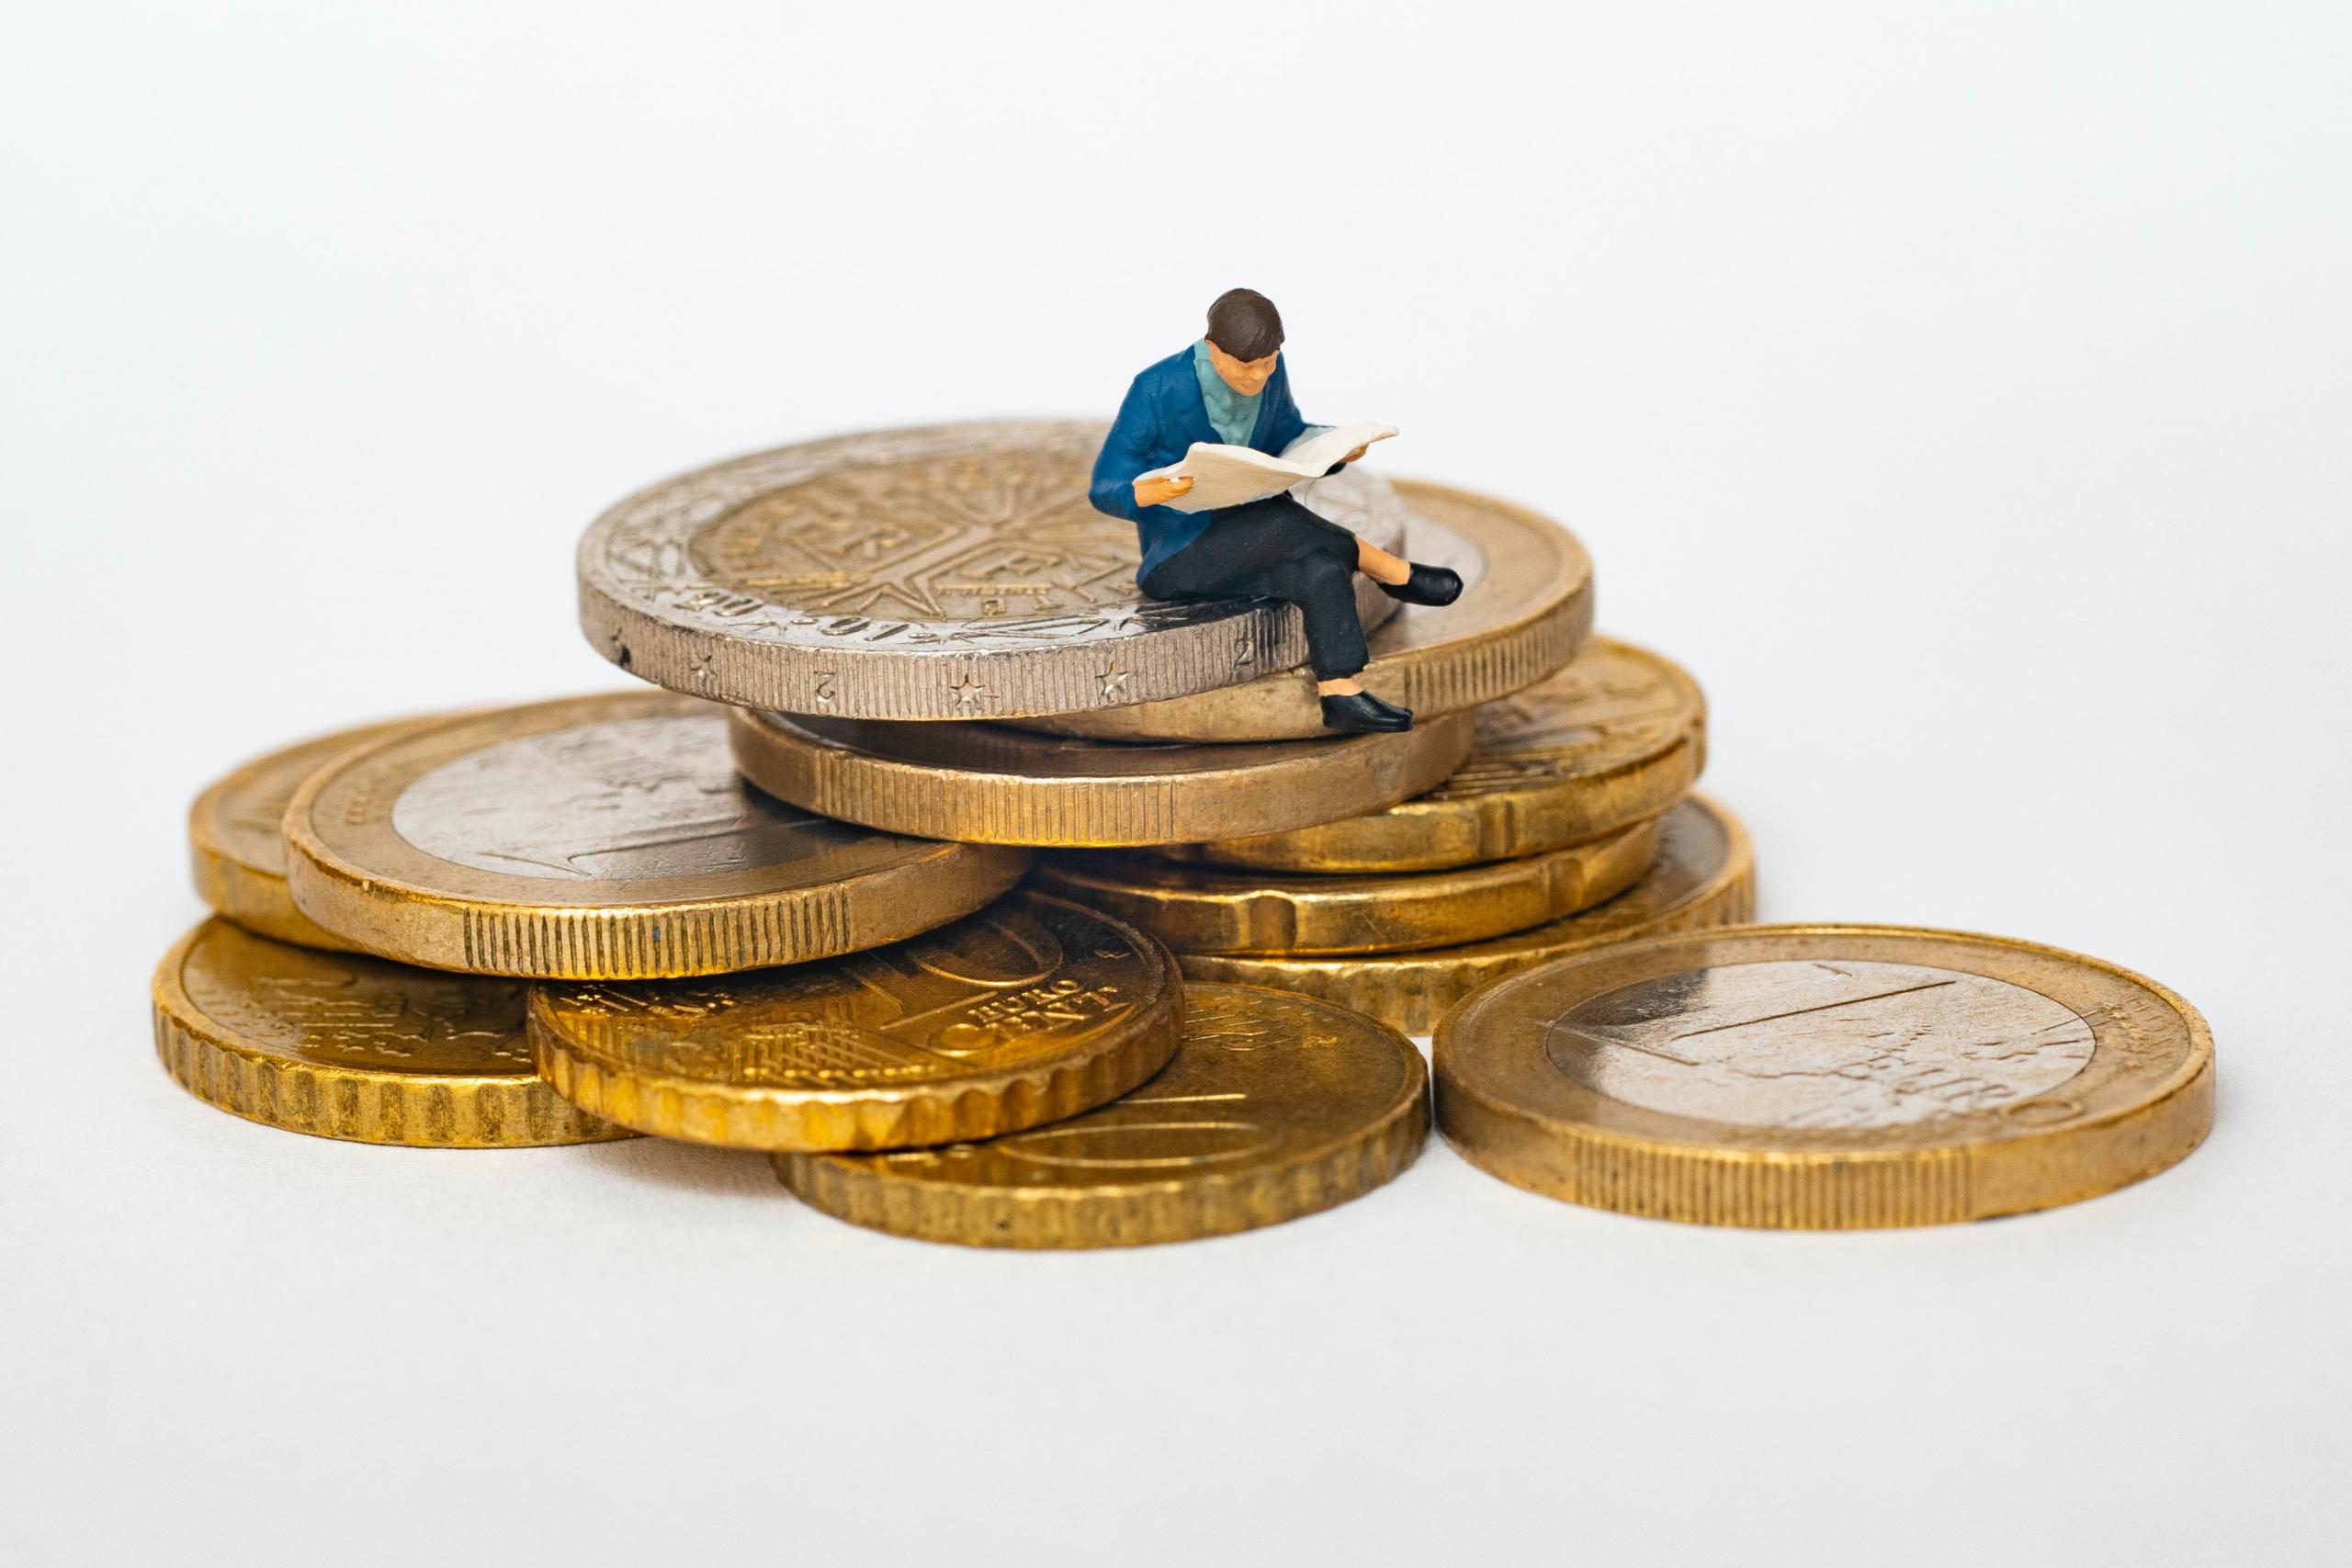 Bagaimana Perkembangan Sektor Properti, Ketika Mengalami Resesi Ekonomi?